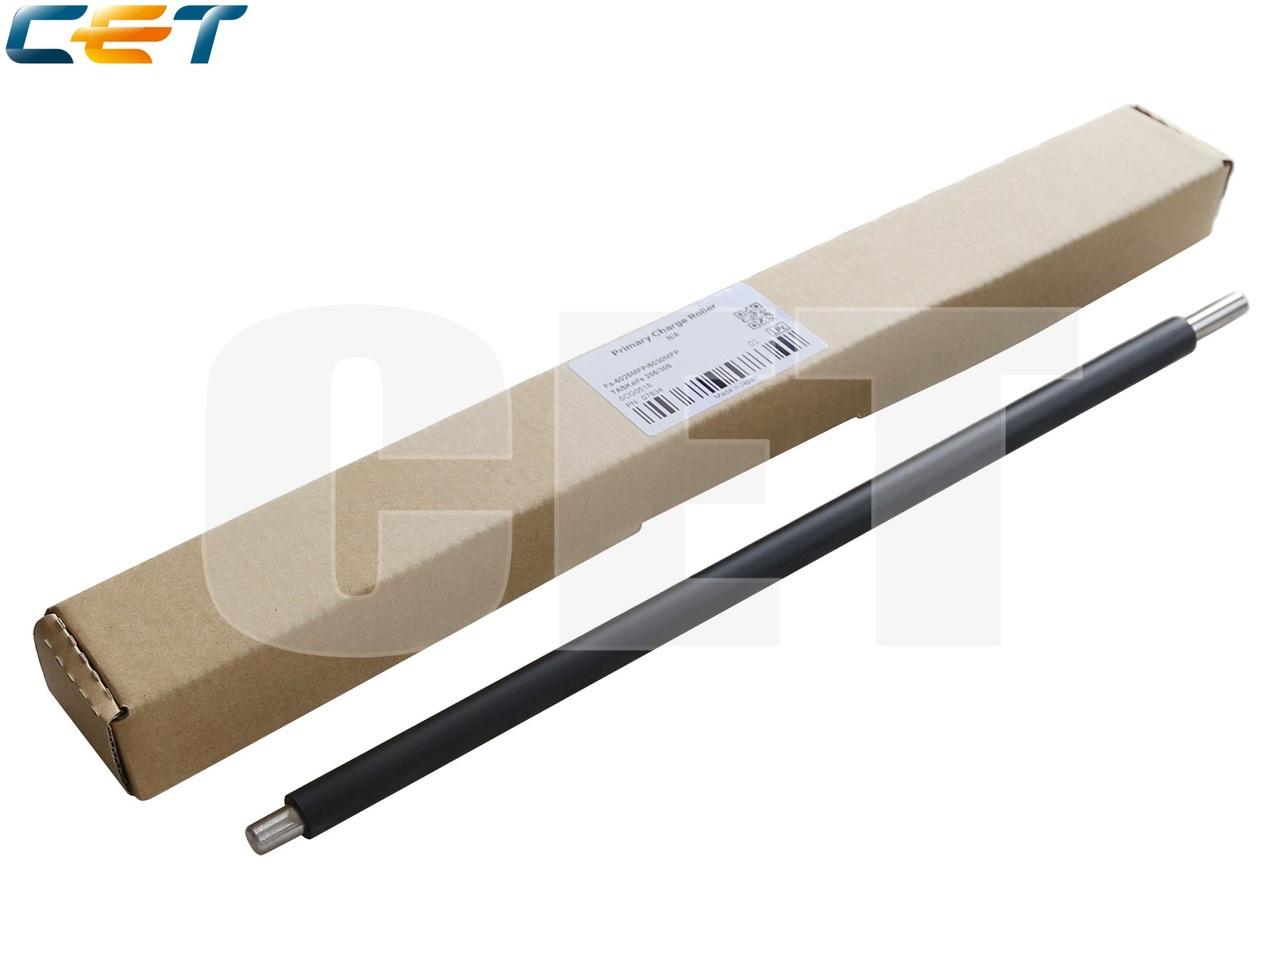 Ролик заряда для KYOCERA FS-6025MFP/6030MFP, TASKalfa255/305 (CET), CET7834